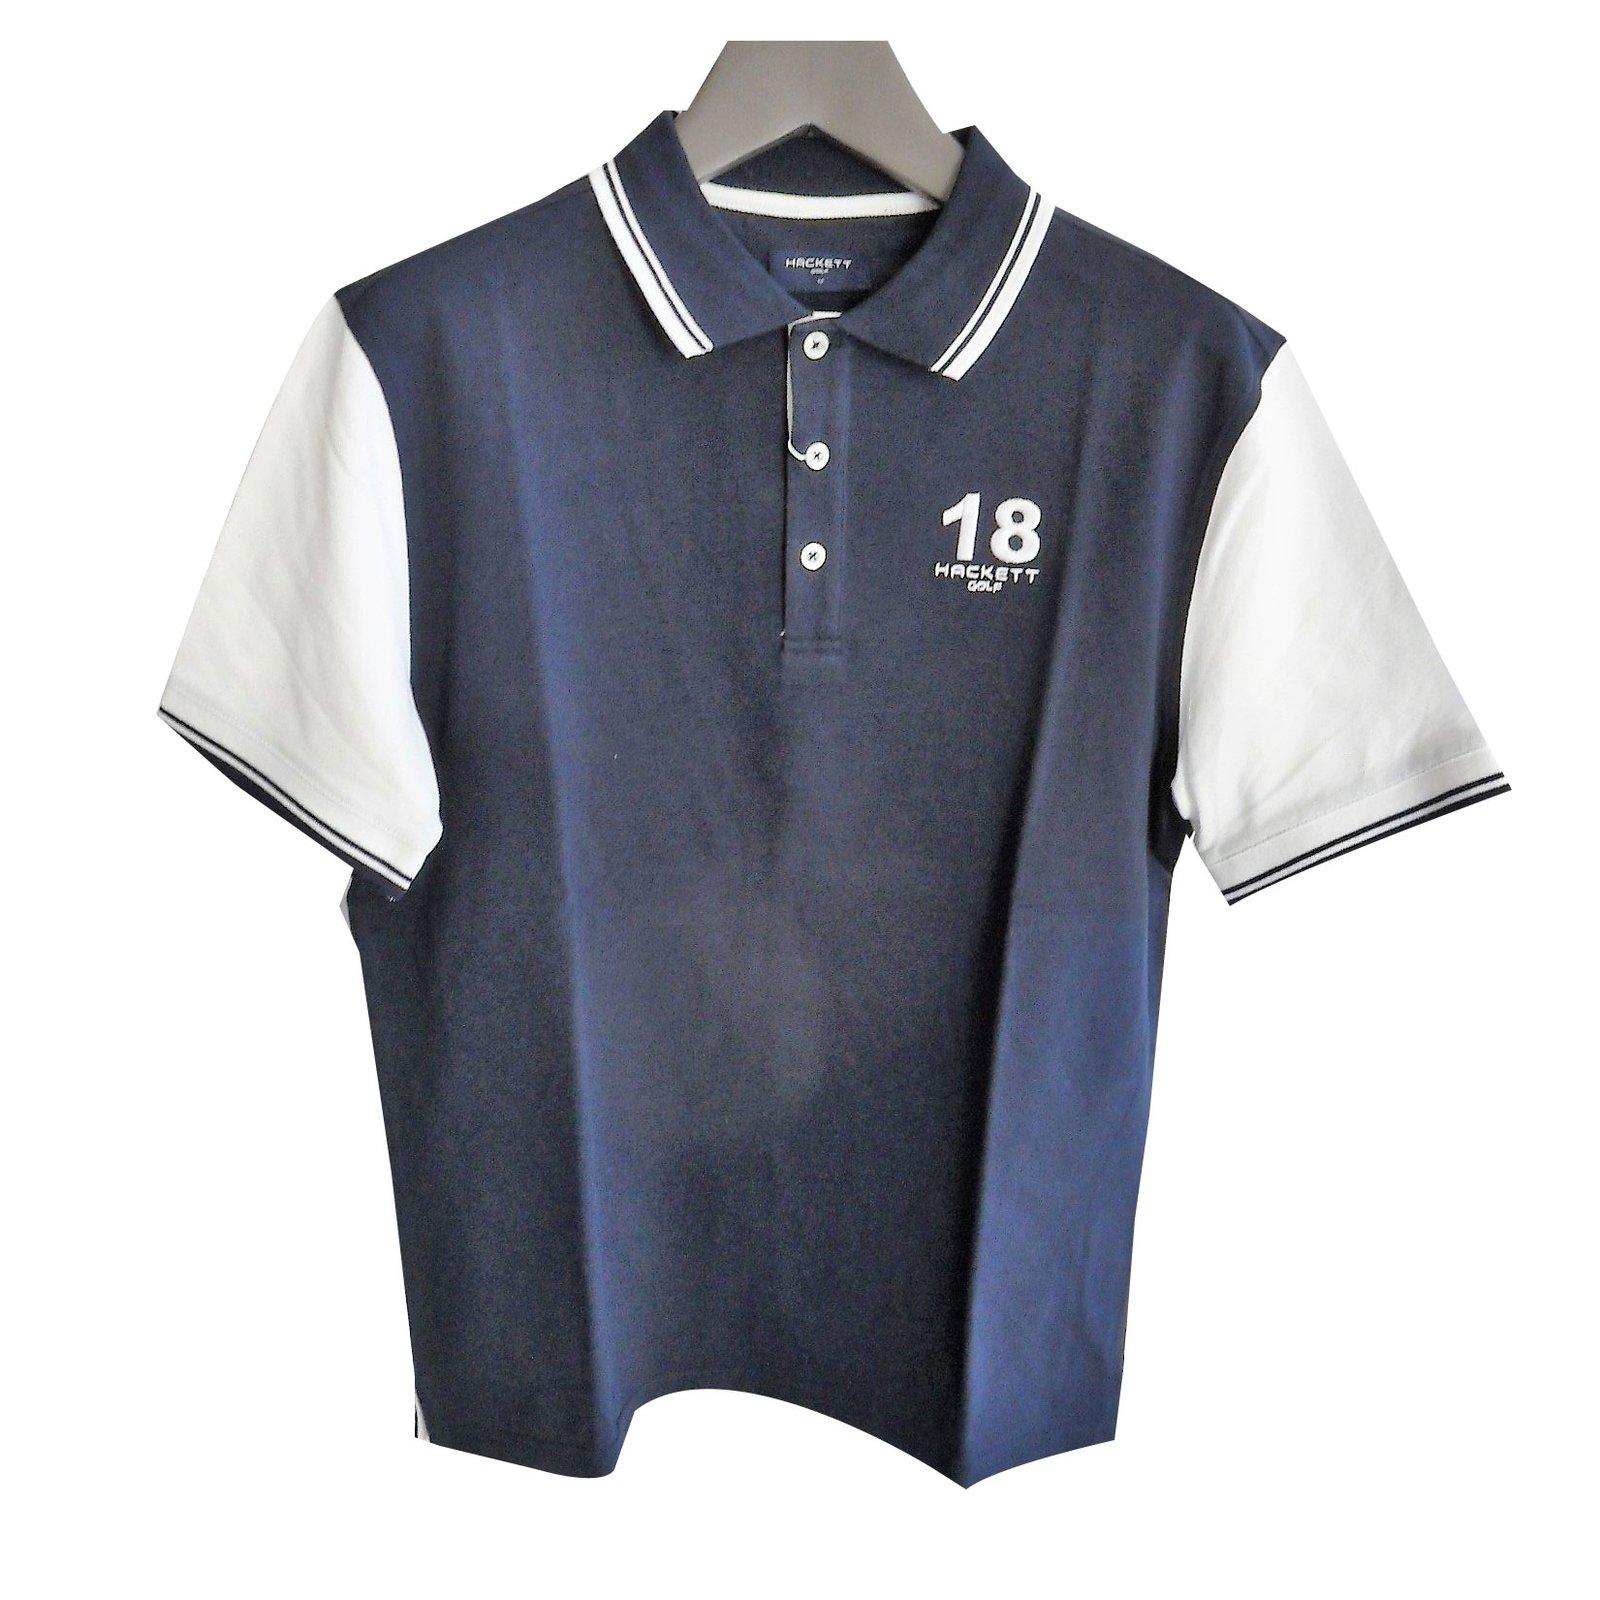 Hackett London Hackett brand new men s navy blue   white polo shirt Polos  Cotton White 11cd5720bc3e